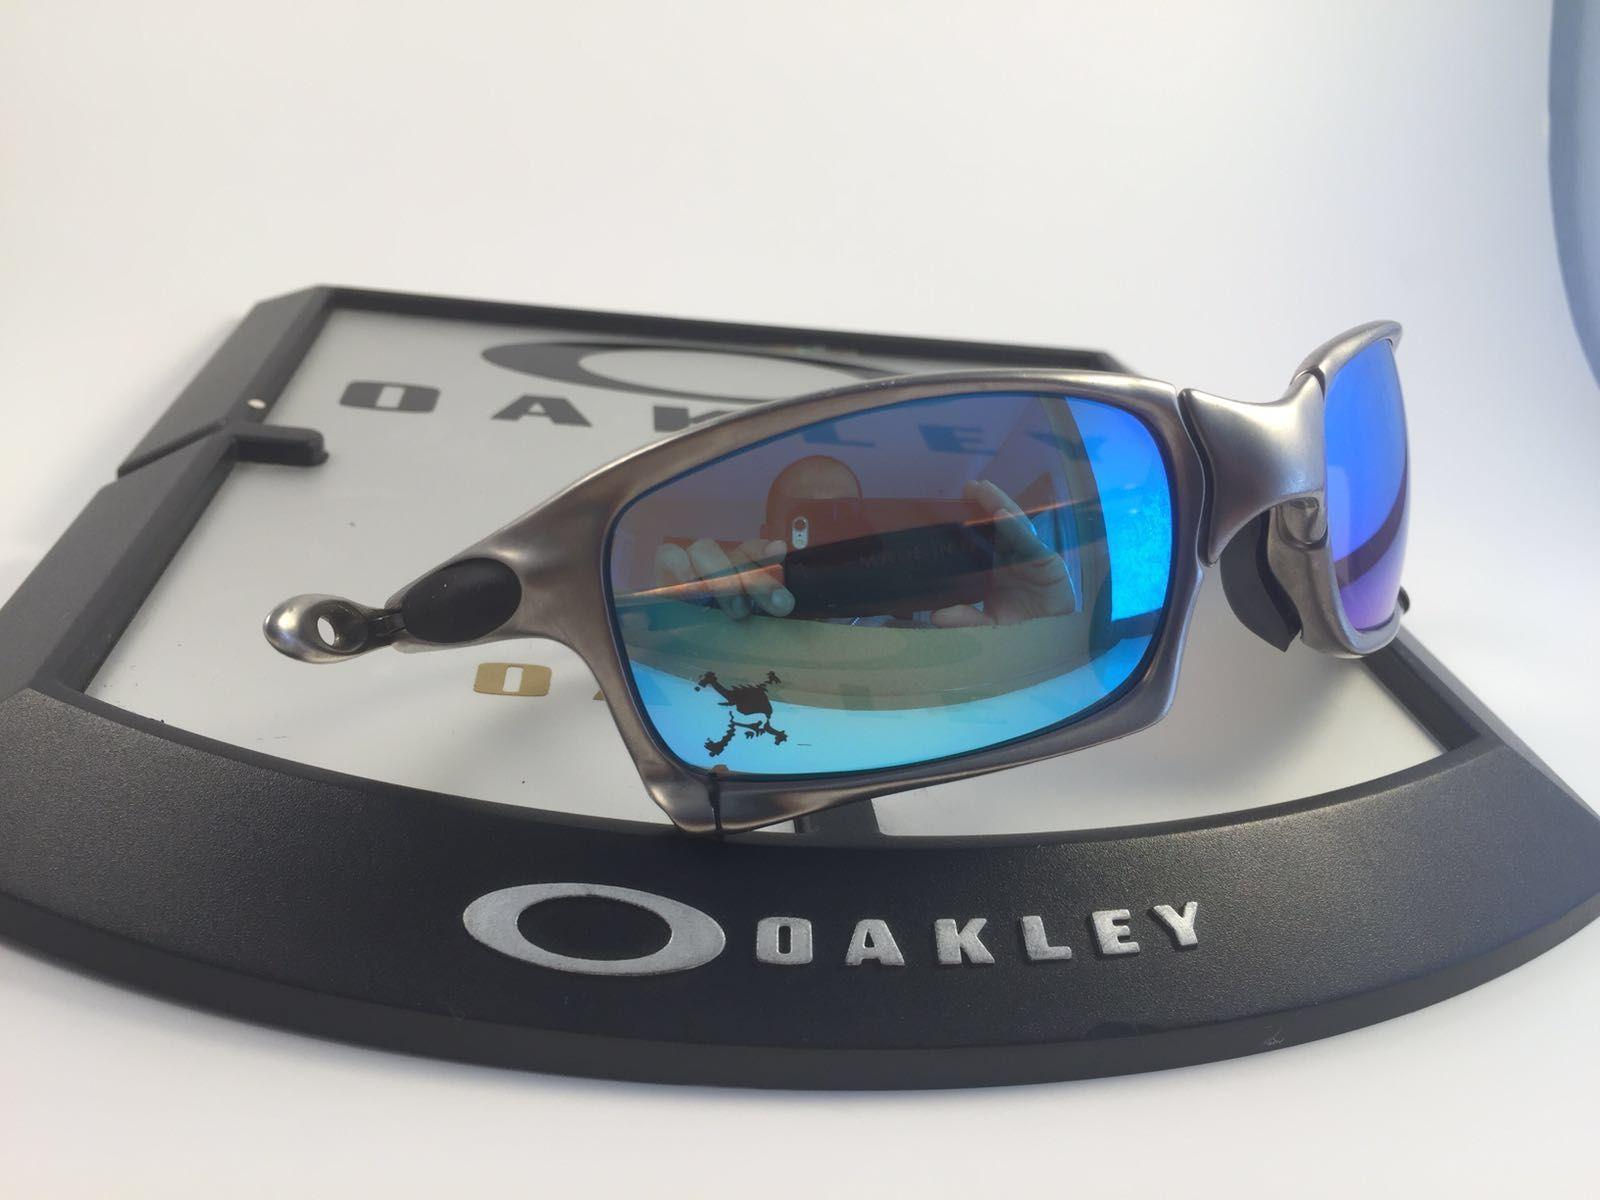 oakley x squared plasma - 888a077b-9108-4a7b-a339-04692dce913a.jpeg